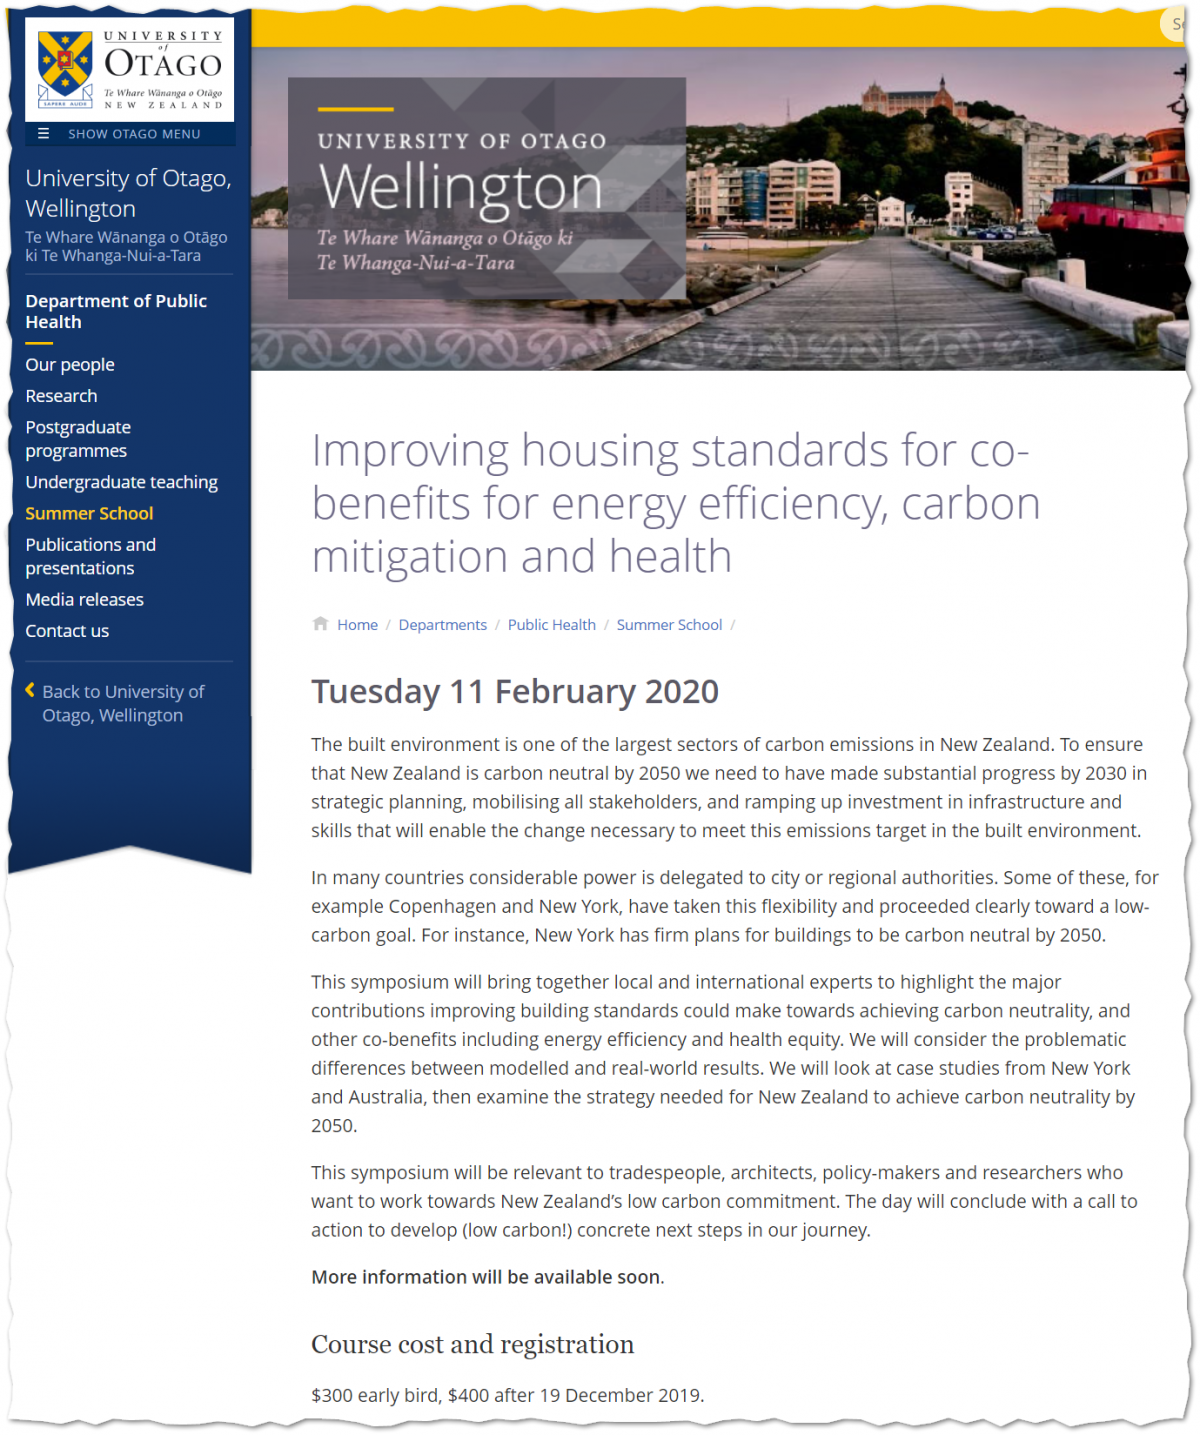 20191104_UniversityOfOtagoWellington_ImprovingHousingStandardsForCoBenefitsForEnergyEfficiencyCarbonMitigationAndHealth